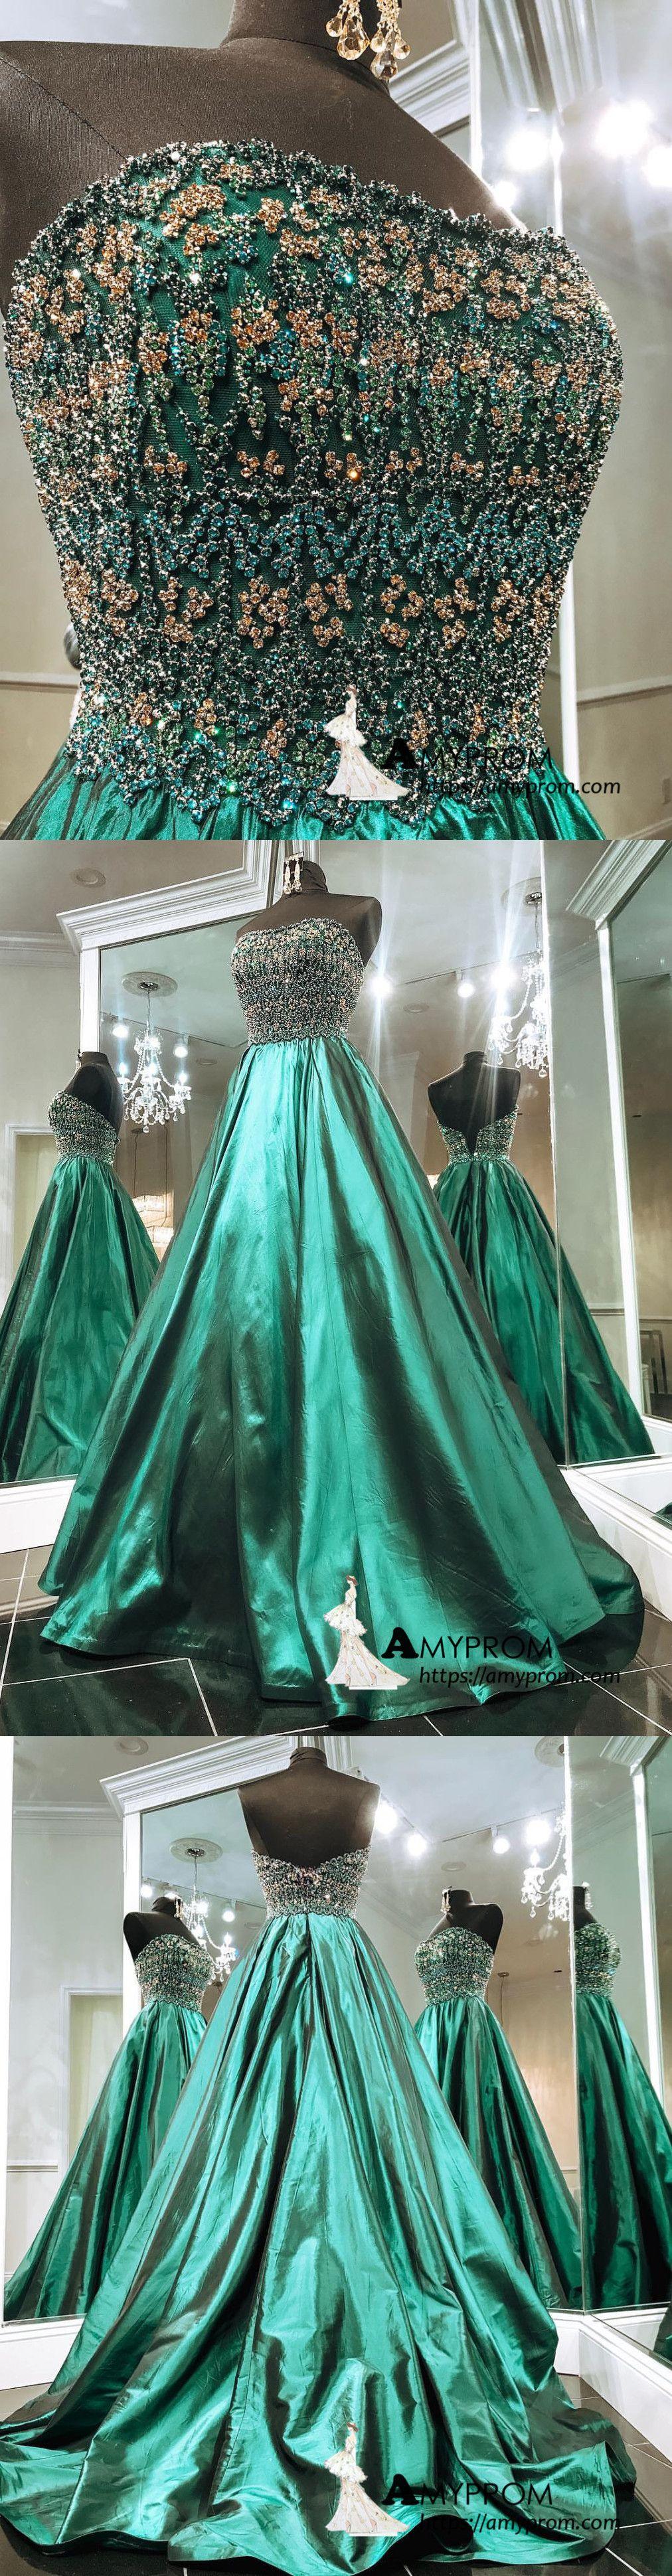 Aline strapless dark green sparkly long prom dress beaded